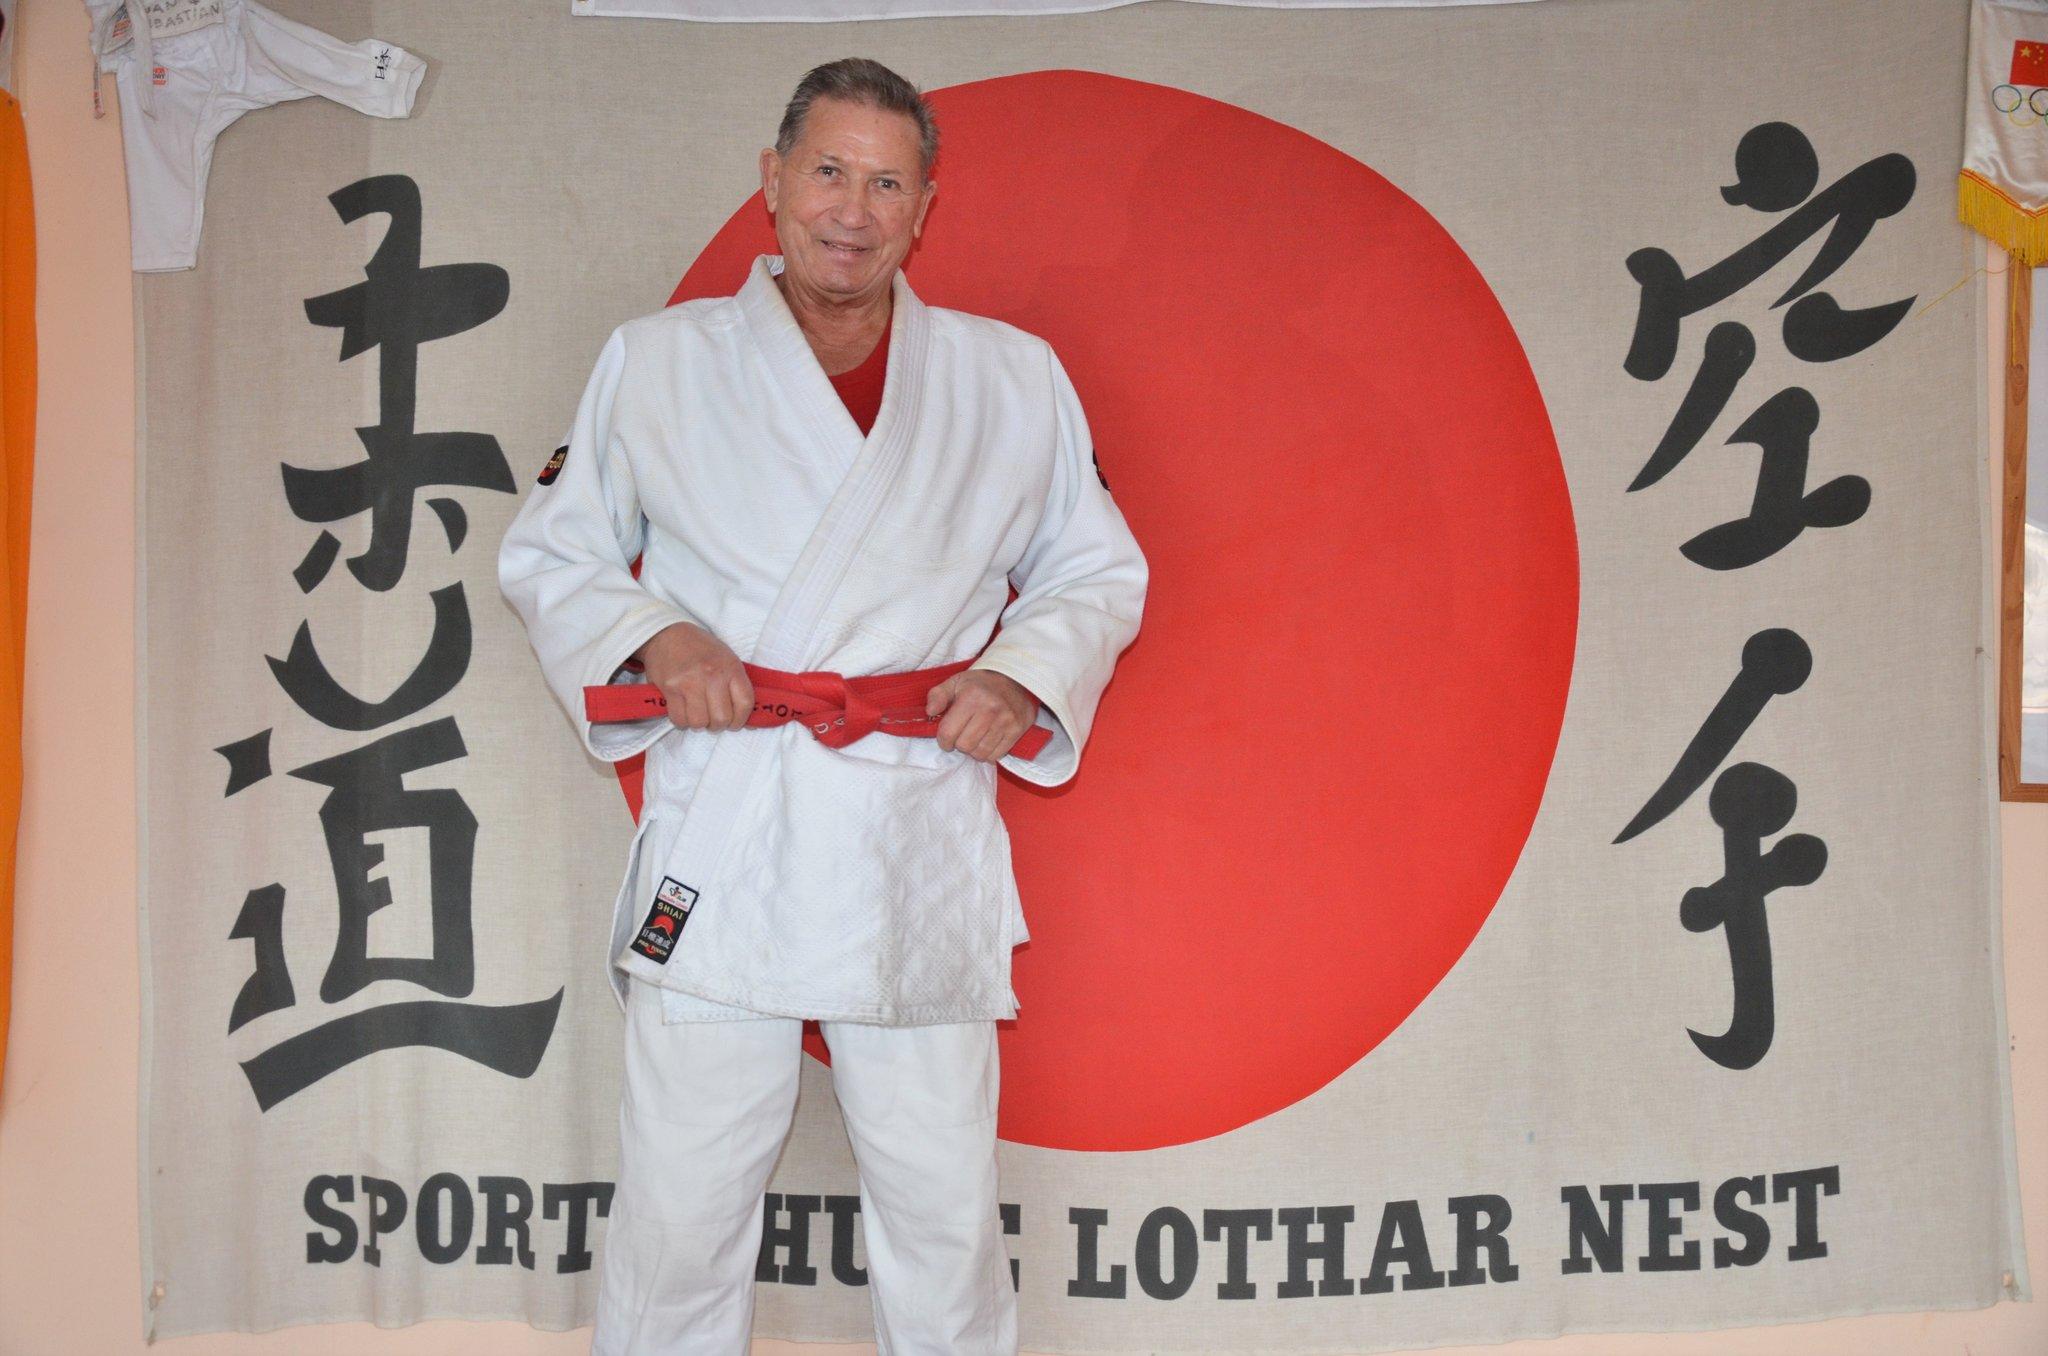 Kampfsportveteran Lothar Nest Mit Dem 10 Dan Geehrt Mariendorf